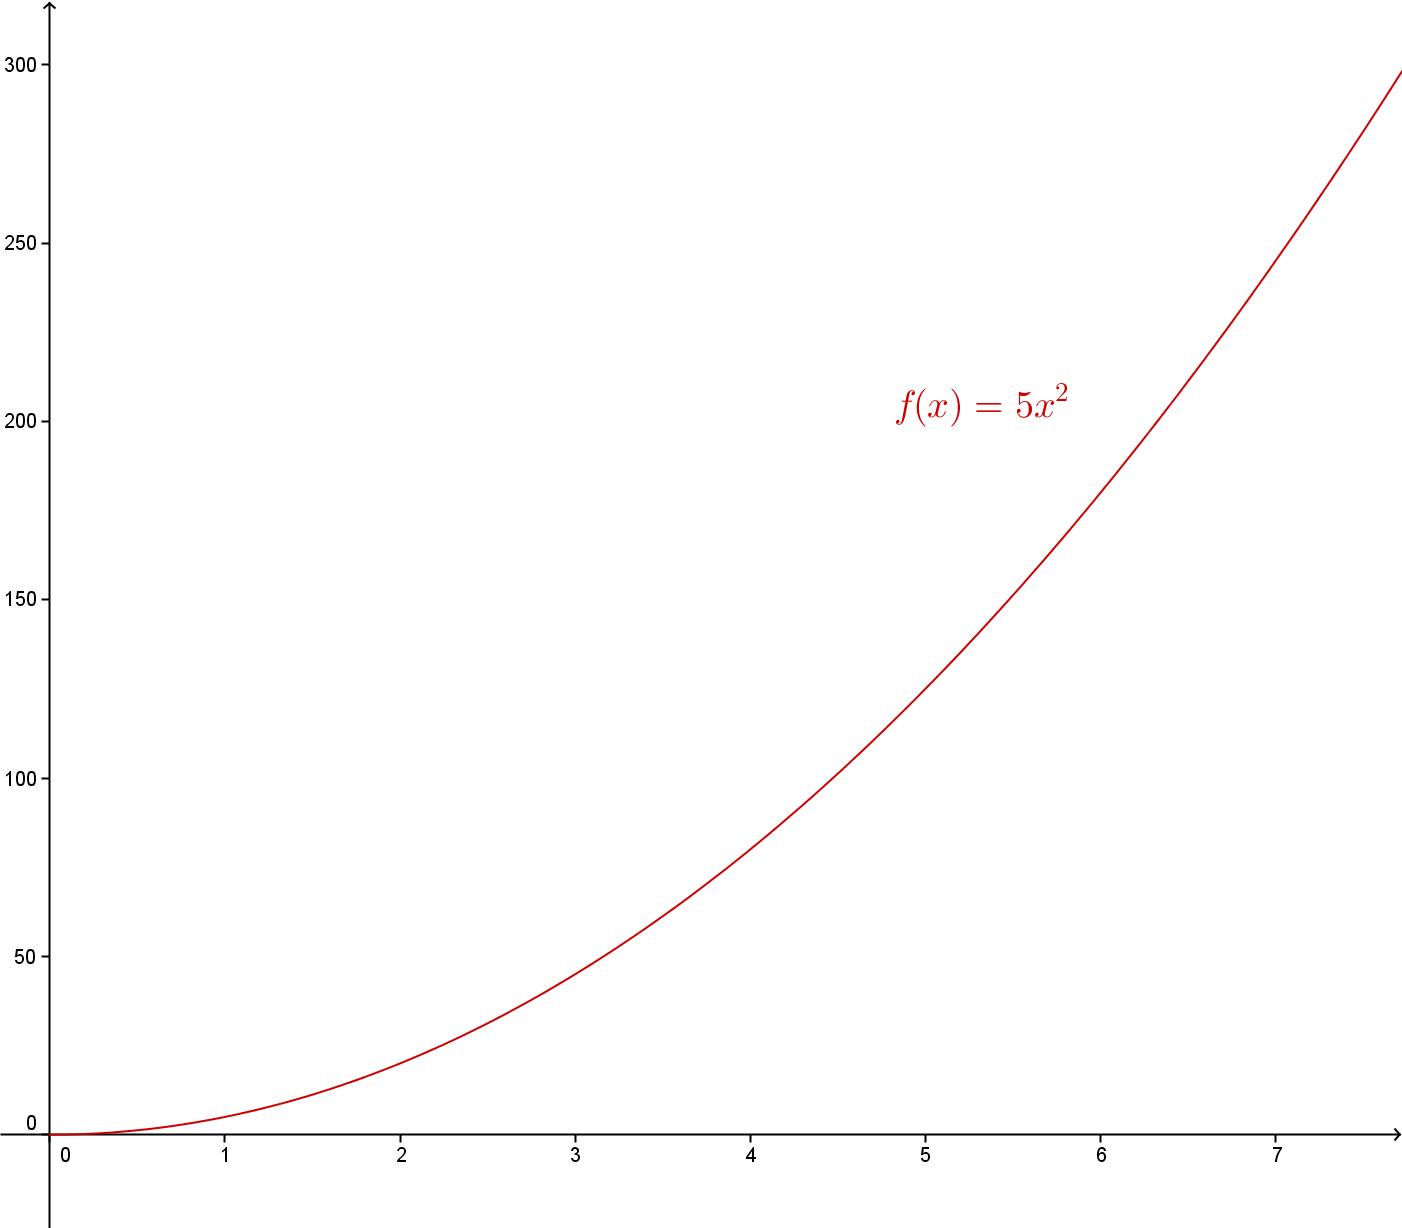 Grafen til f(x) = 5x^2